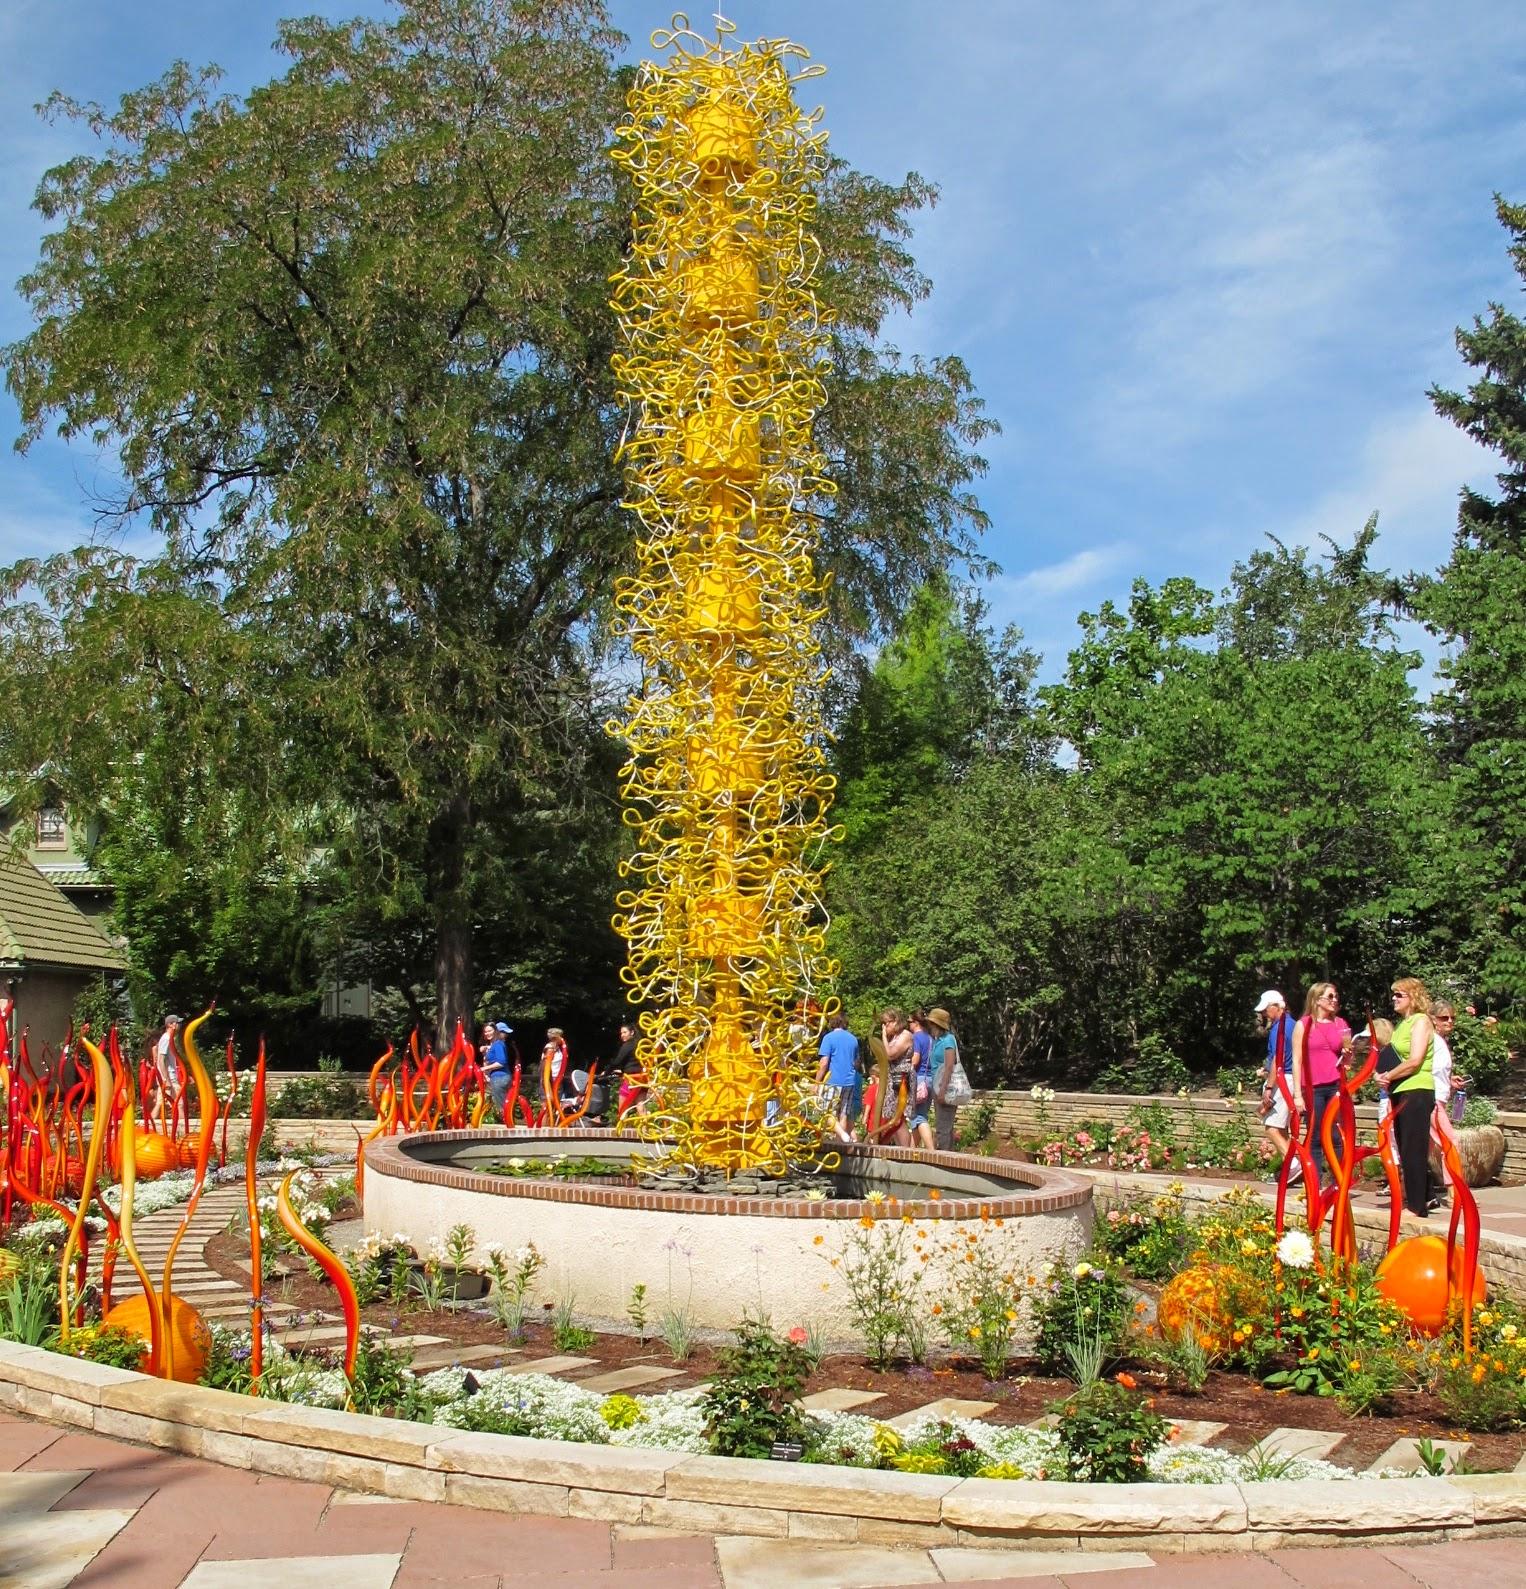 My Messy Room: Chihuly In Denver Botanic Gardens